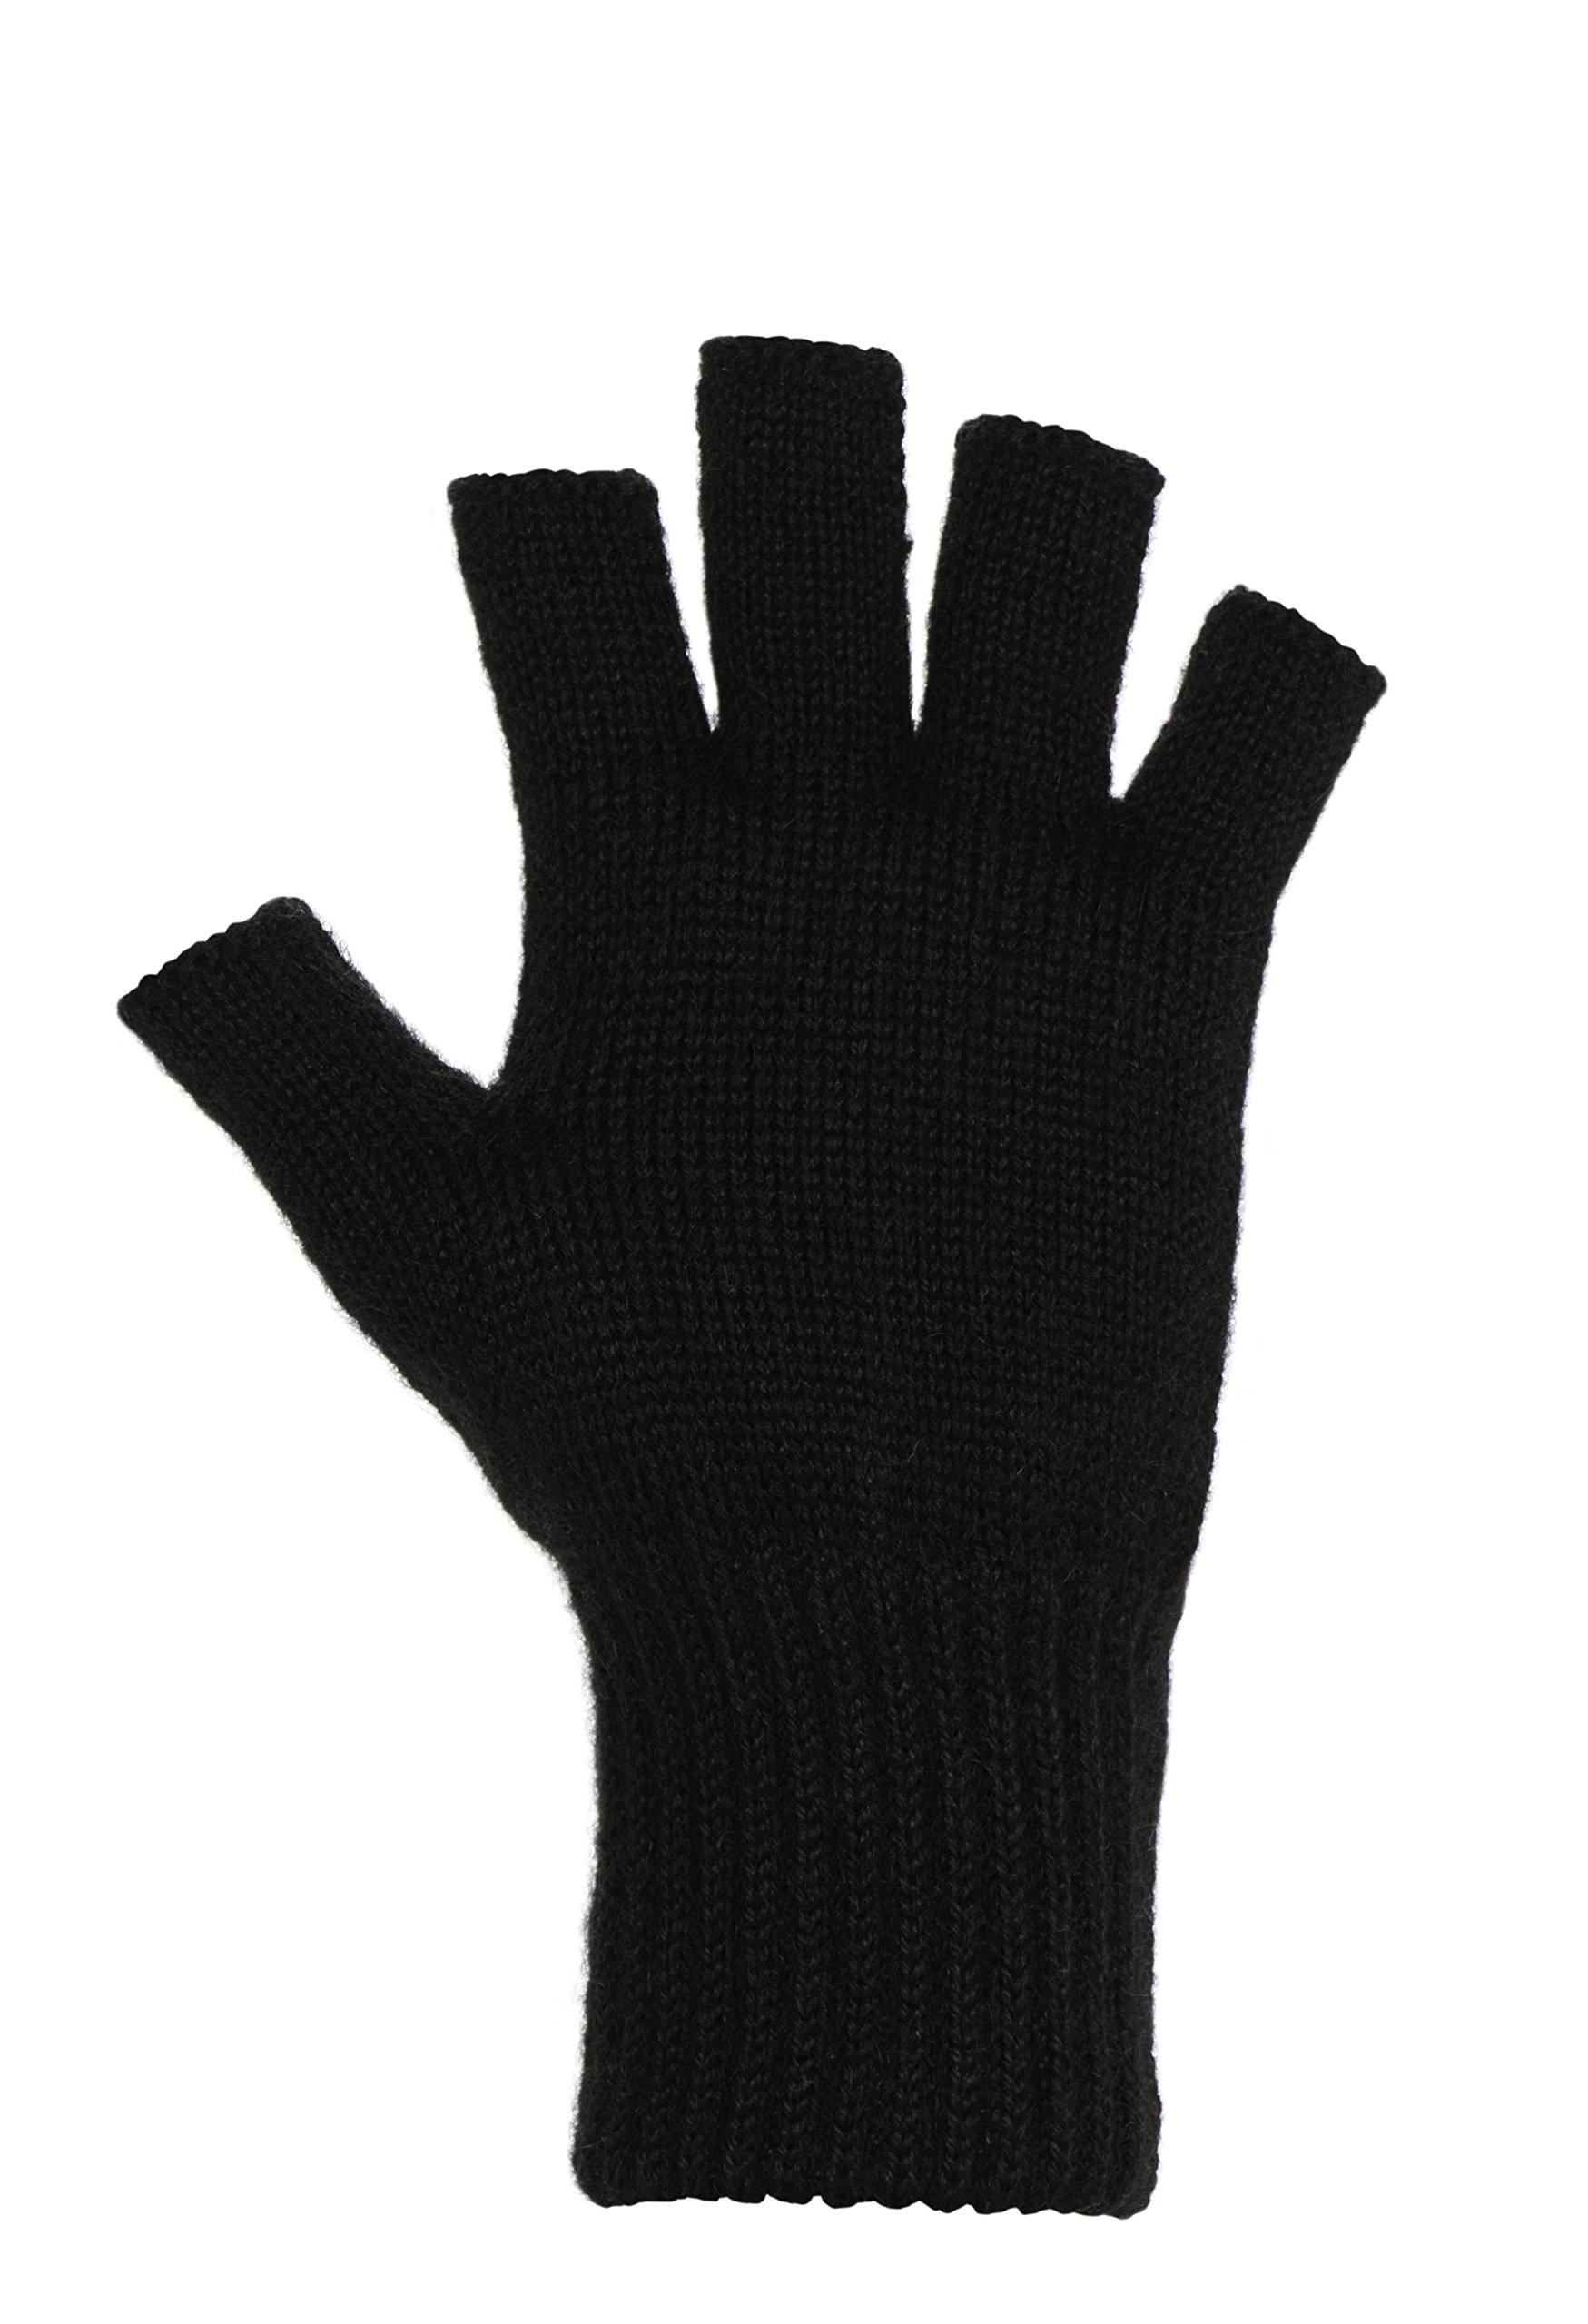 DARN WARM Alpaca FINGERLESS Gloves - BEST NATURAL SOLUTION for COLD HANDS - Black